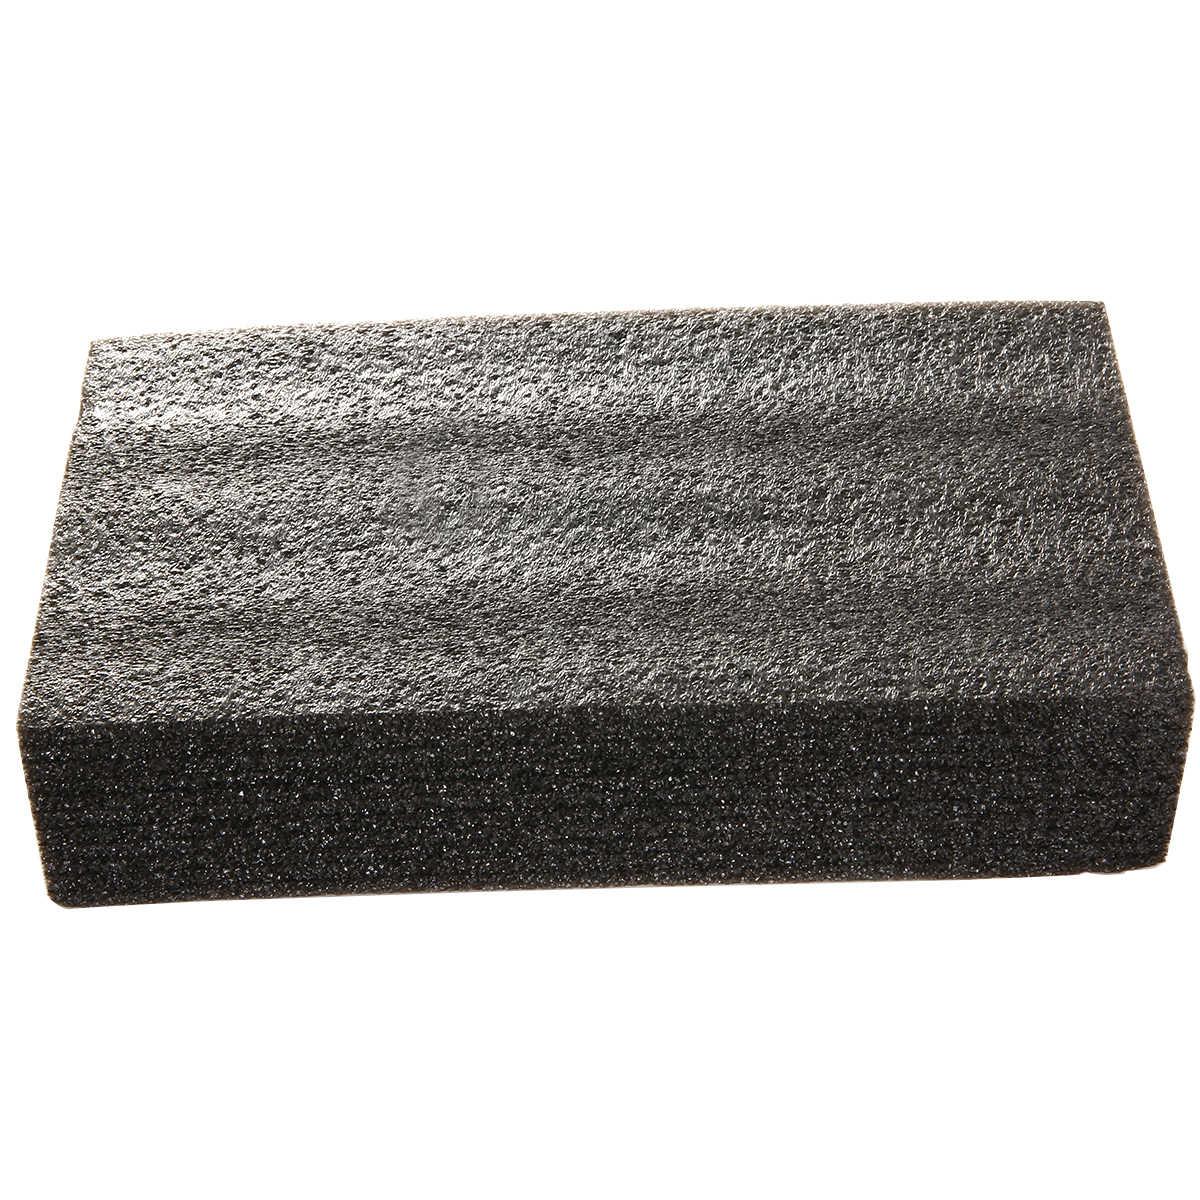 1pc Needle Pin Felting Dense Foam Pad Cushion Mat Holder Insertion Craft Felting Tool 25*15*5cm Wool Felt Sewing Accessories